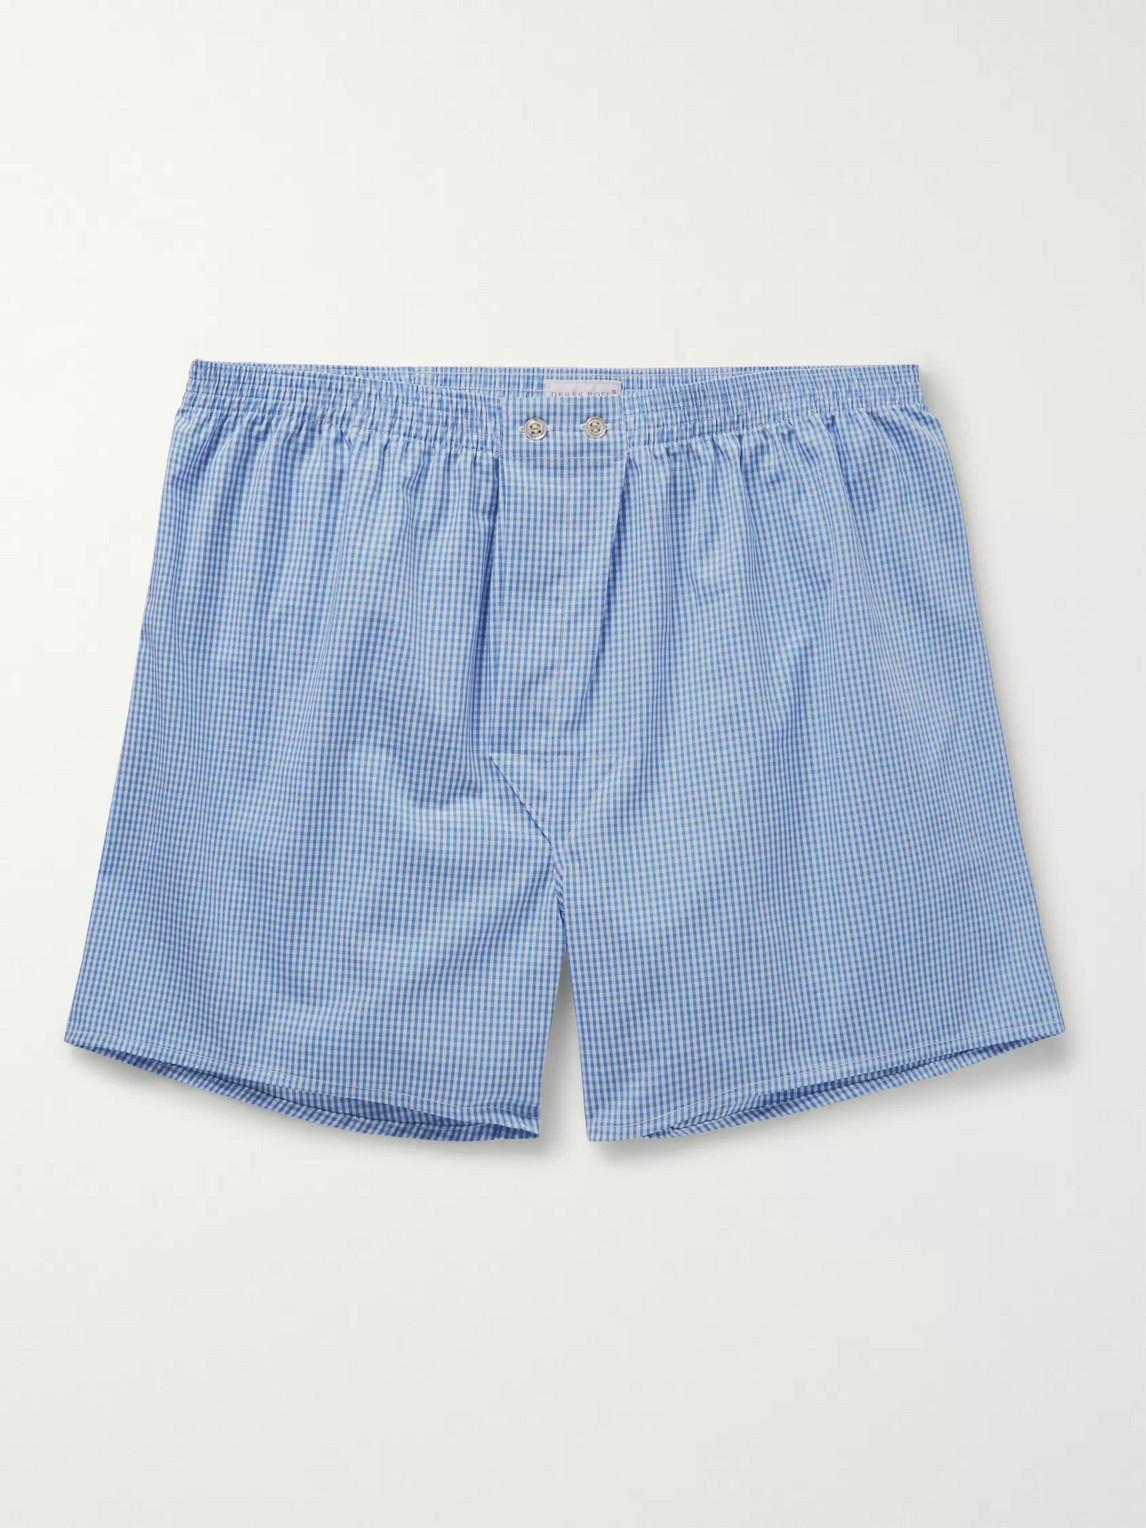 derek rose - gingham cotton boxer shorts - blue - l - men